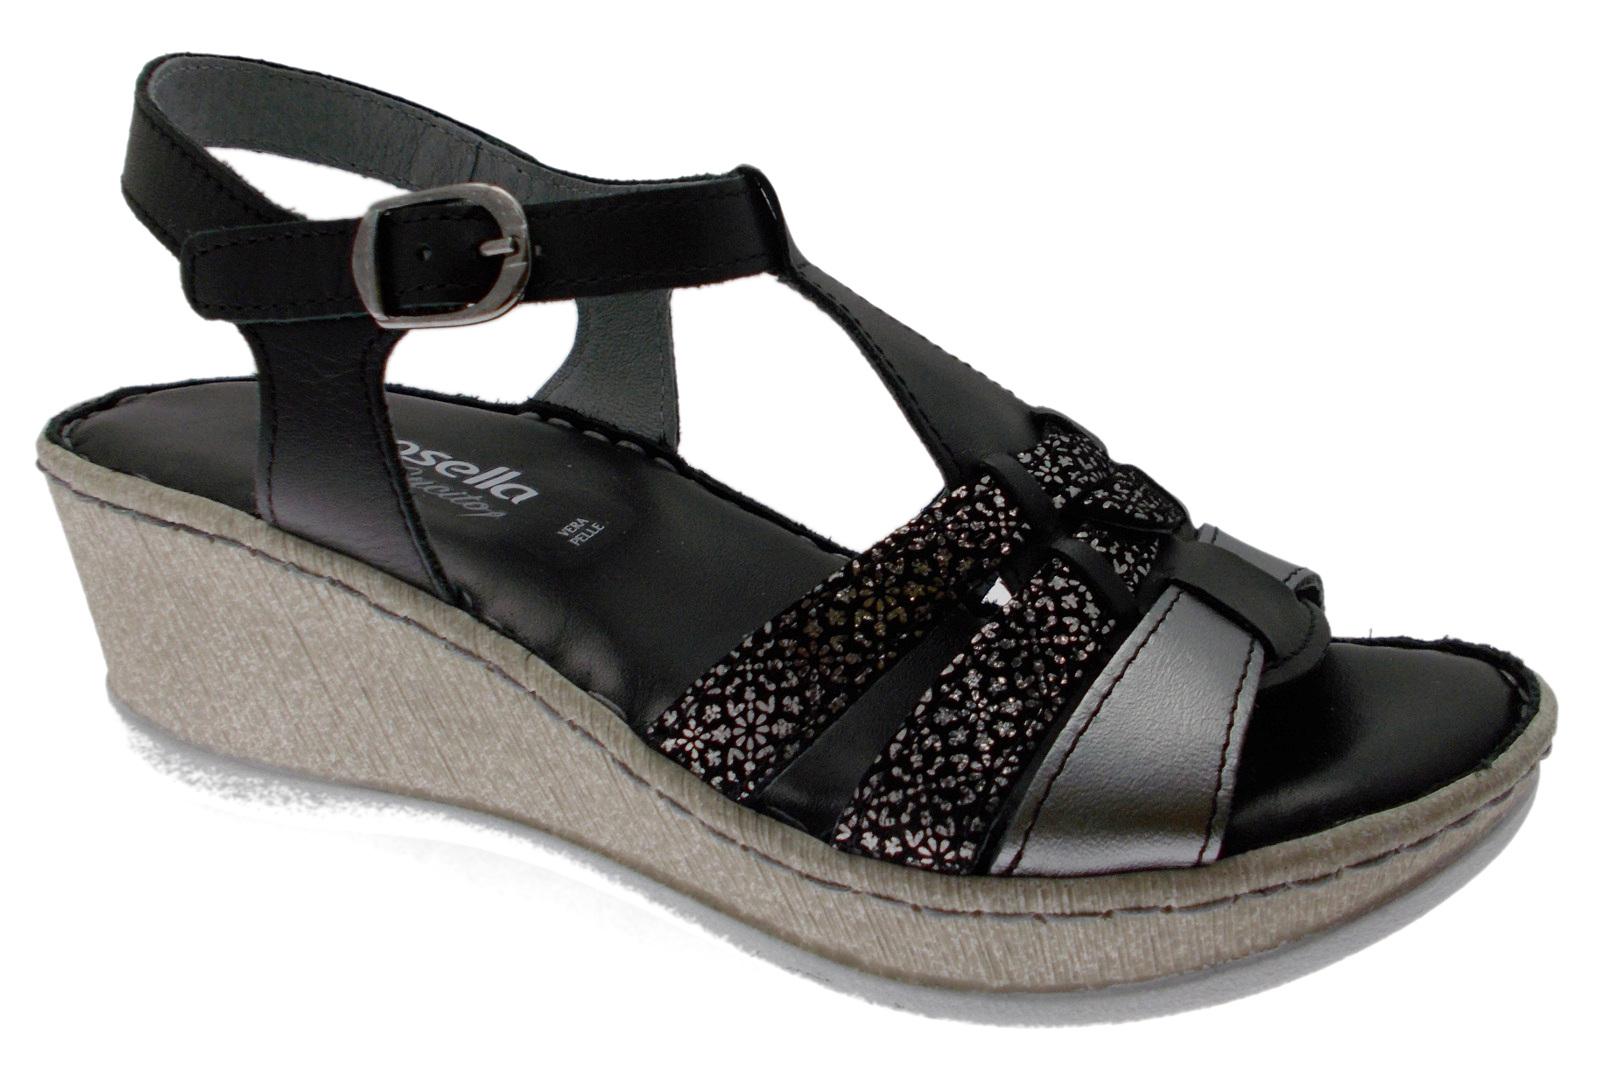 6348 sandalen zwart plantair sandaal Riposella